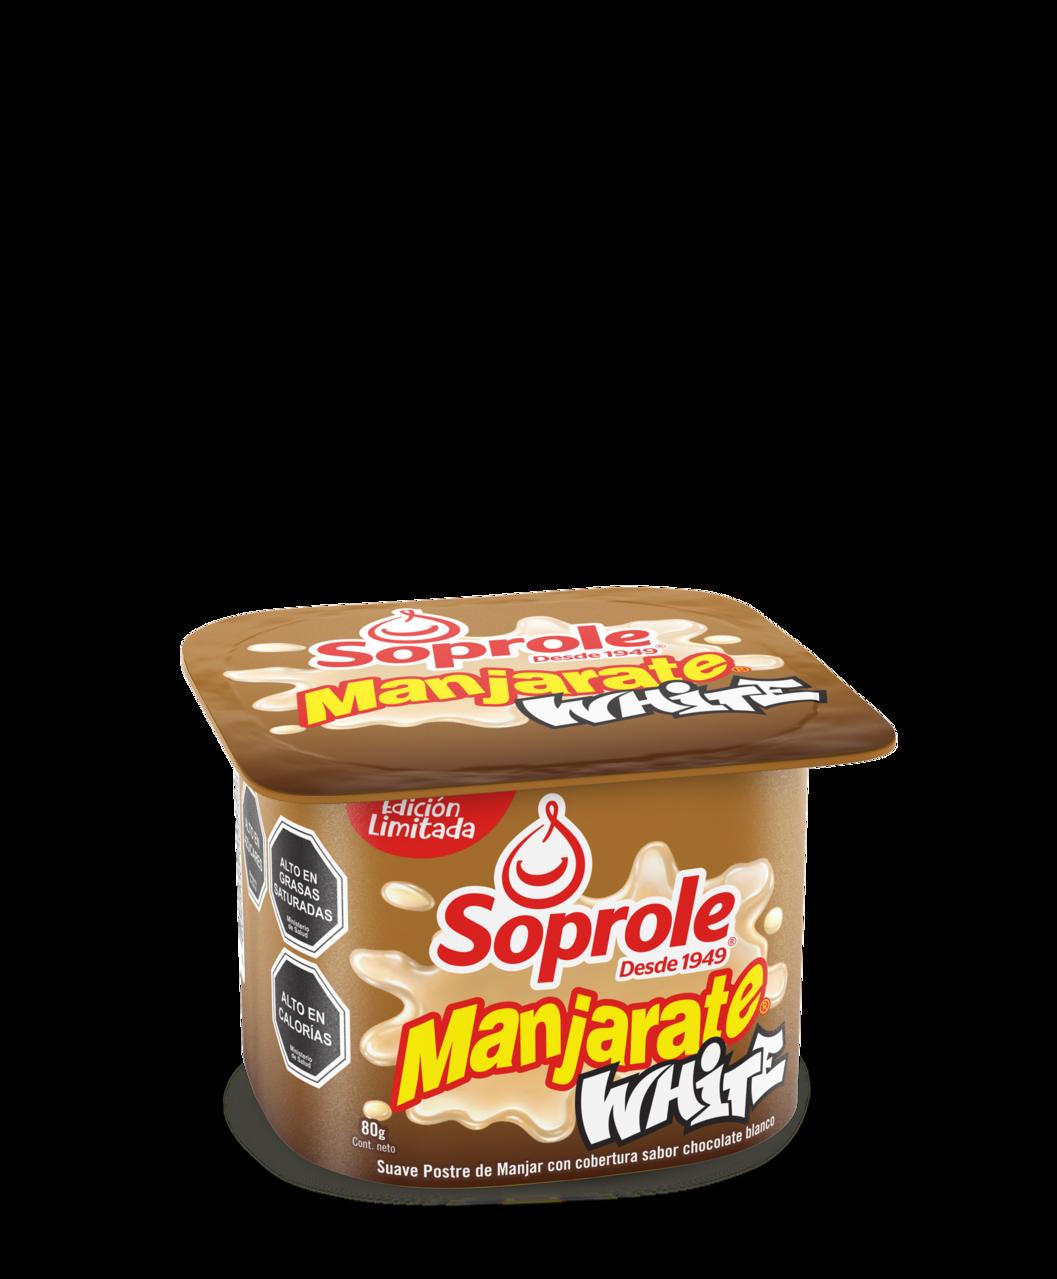 Soprole Manjarate white